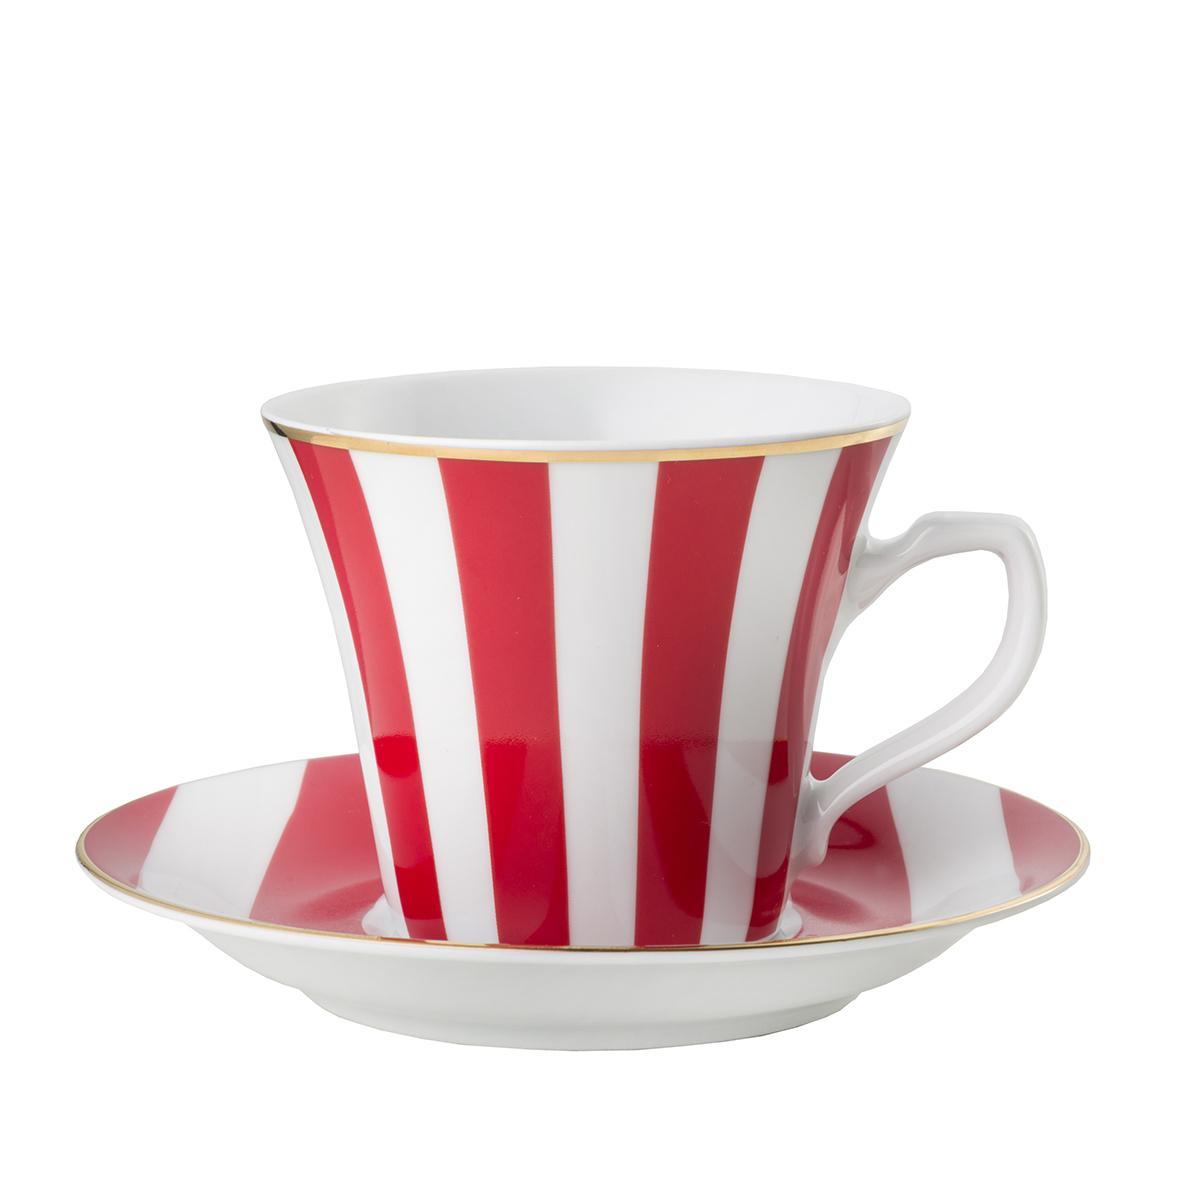 Filiżanka Stripes Red